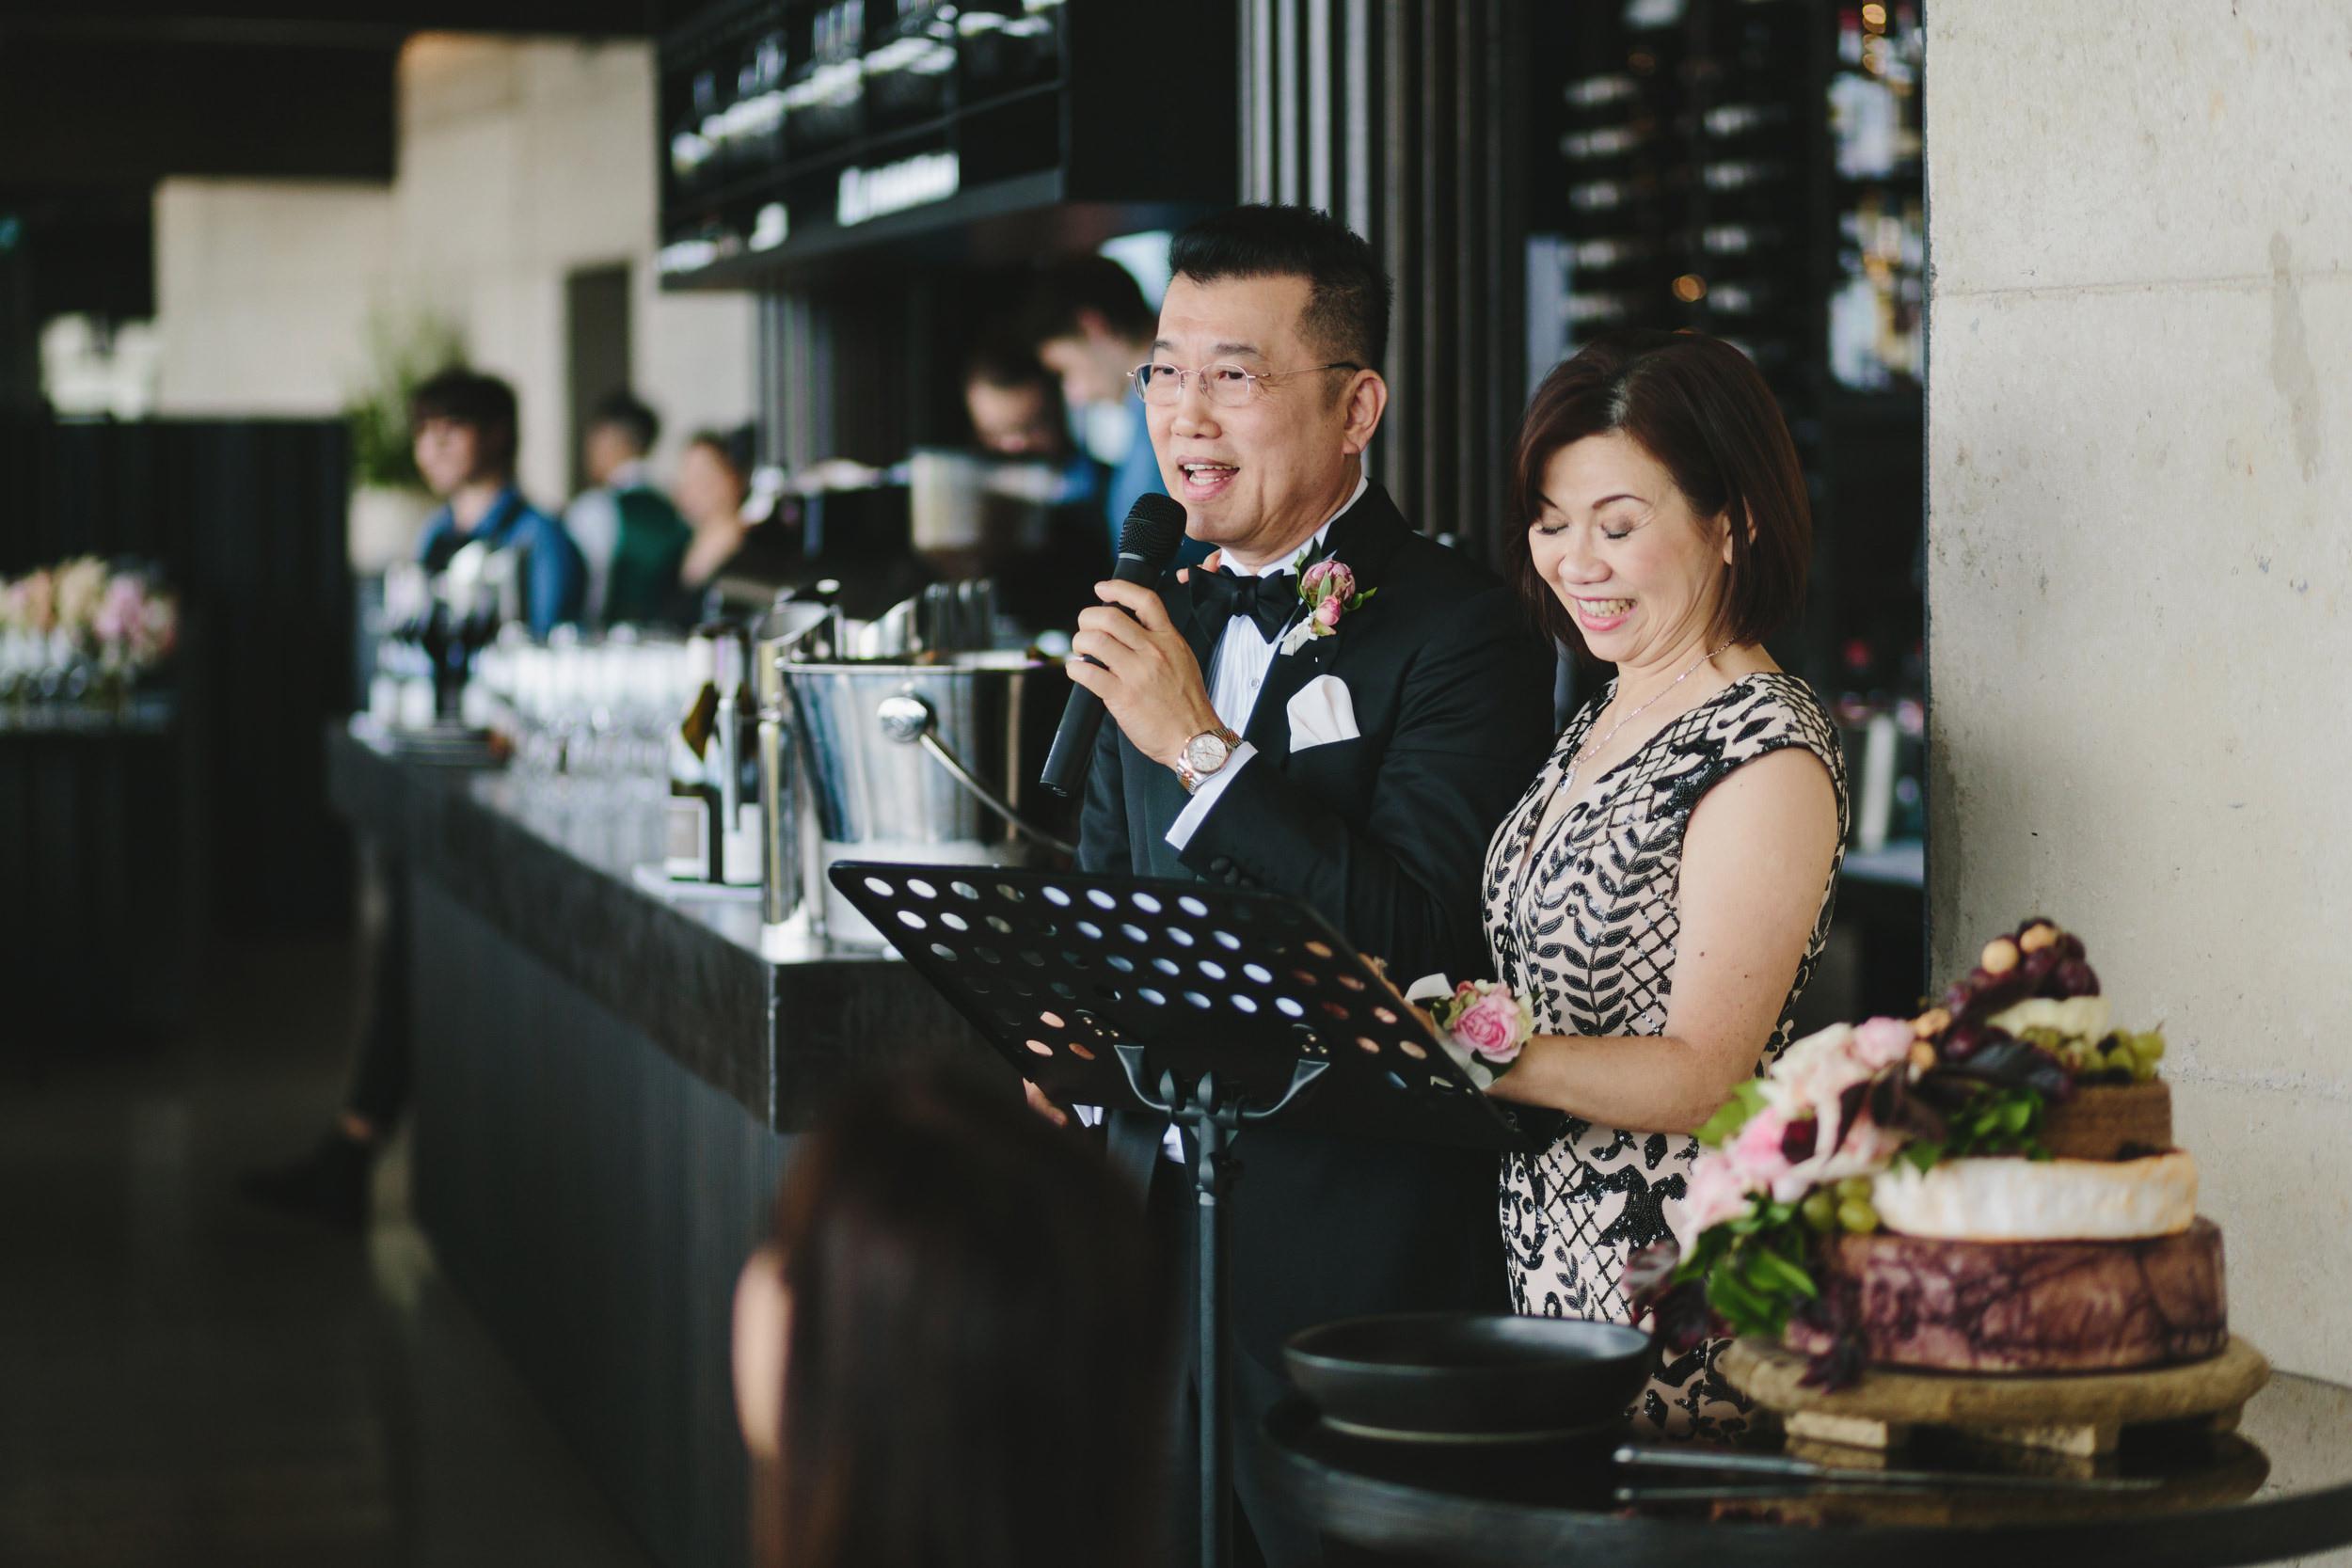 Melbourne Winery Wedding Daryl & Adeline 69.JPG